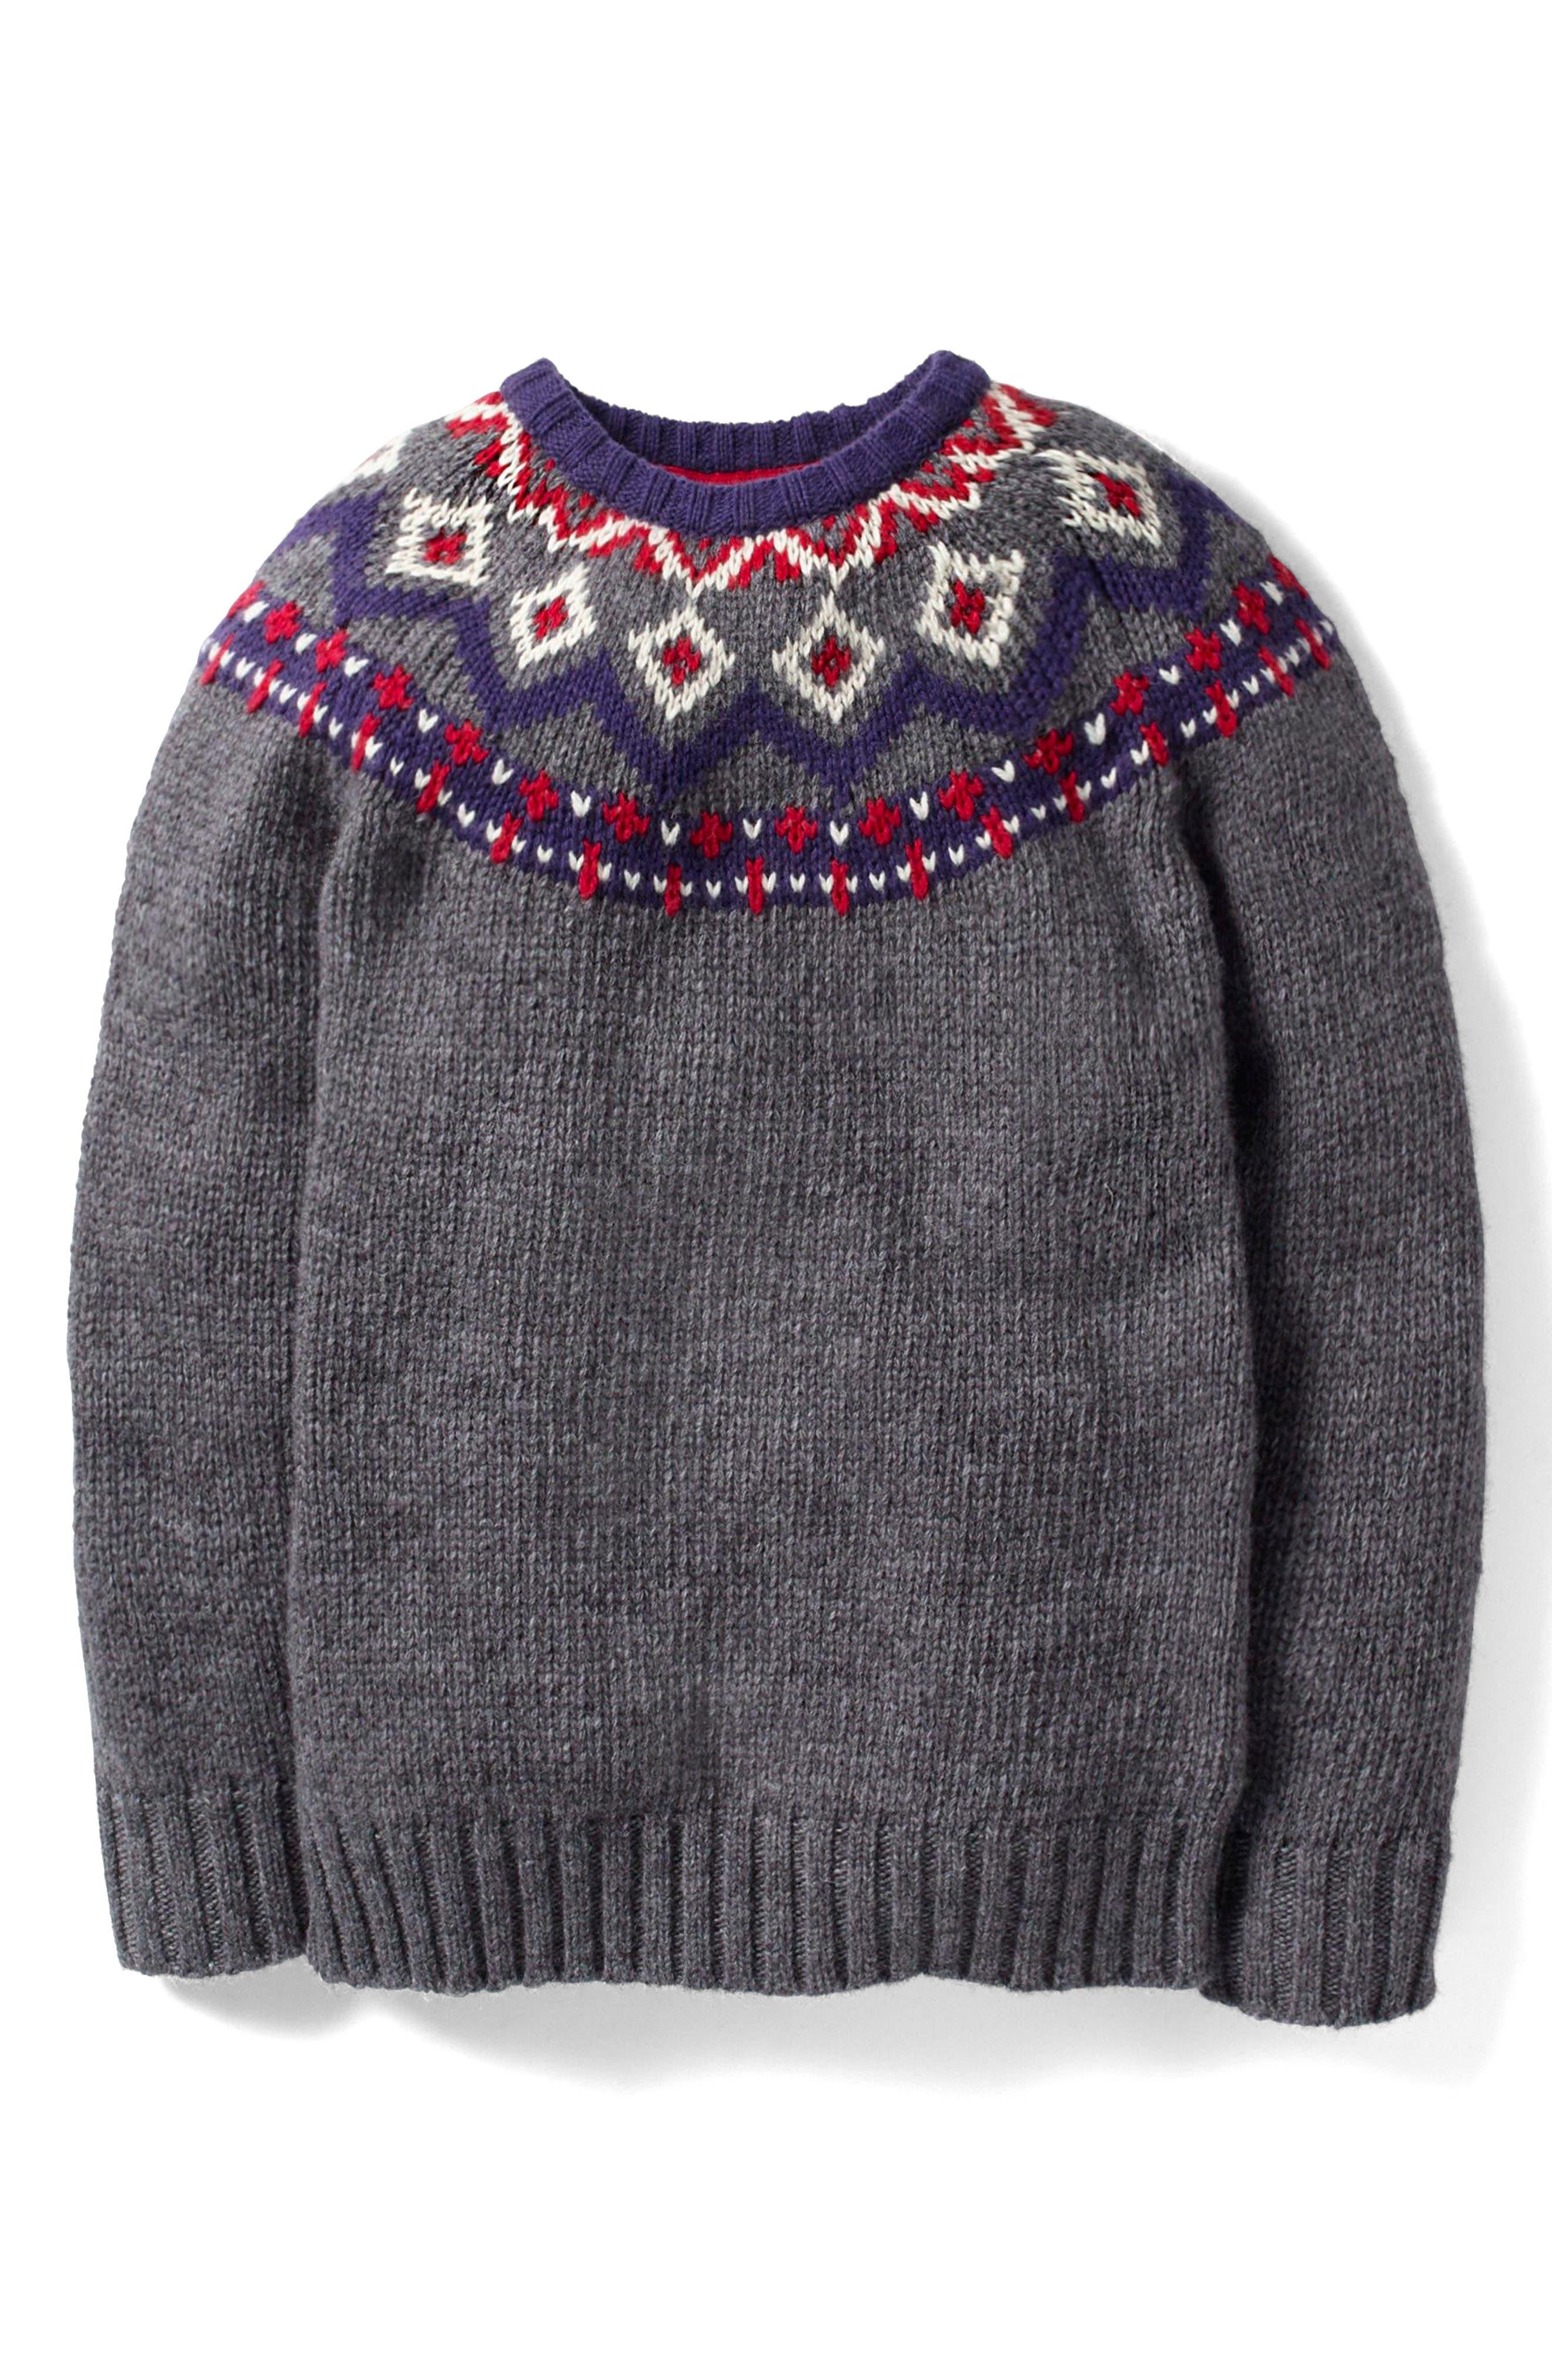 Mini Boden Fair Aisle Wool Sweater (Toddler Boys, Little Boys & Big Boys)